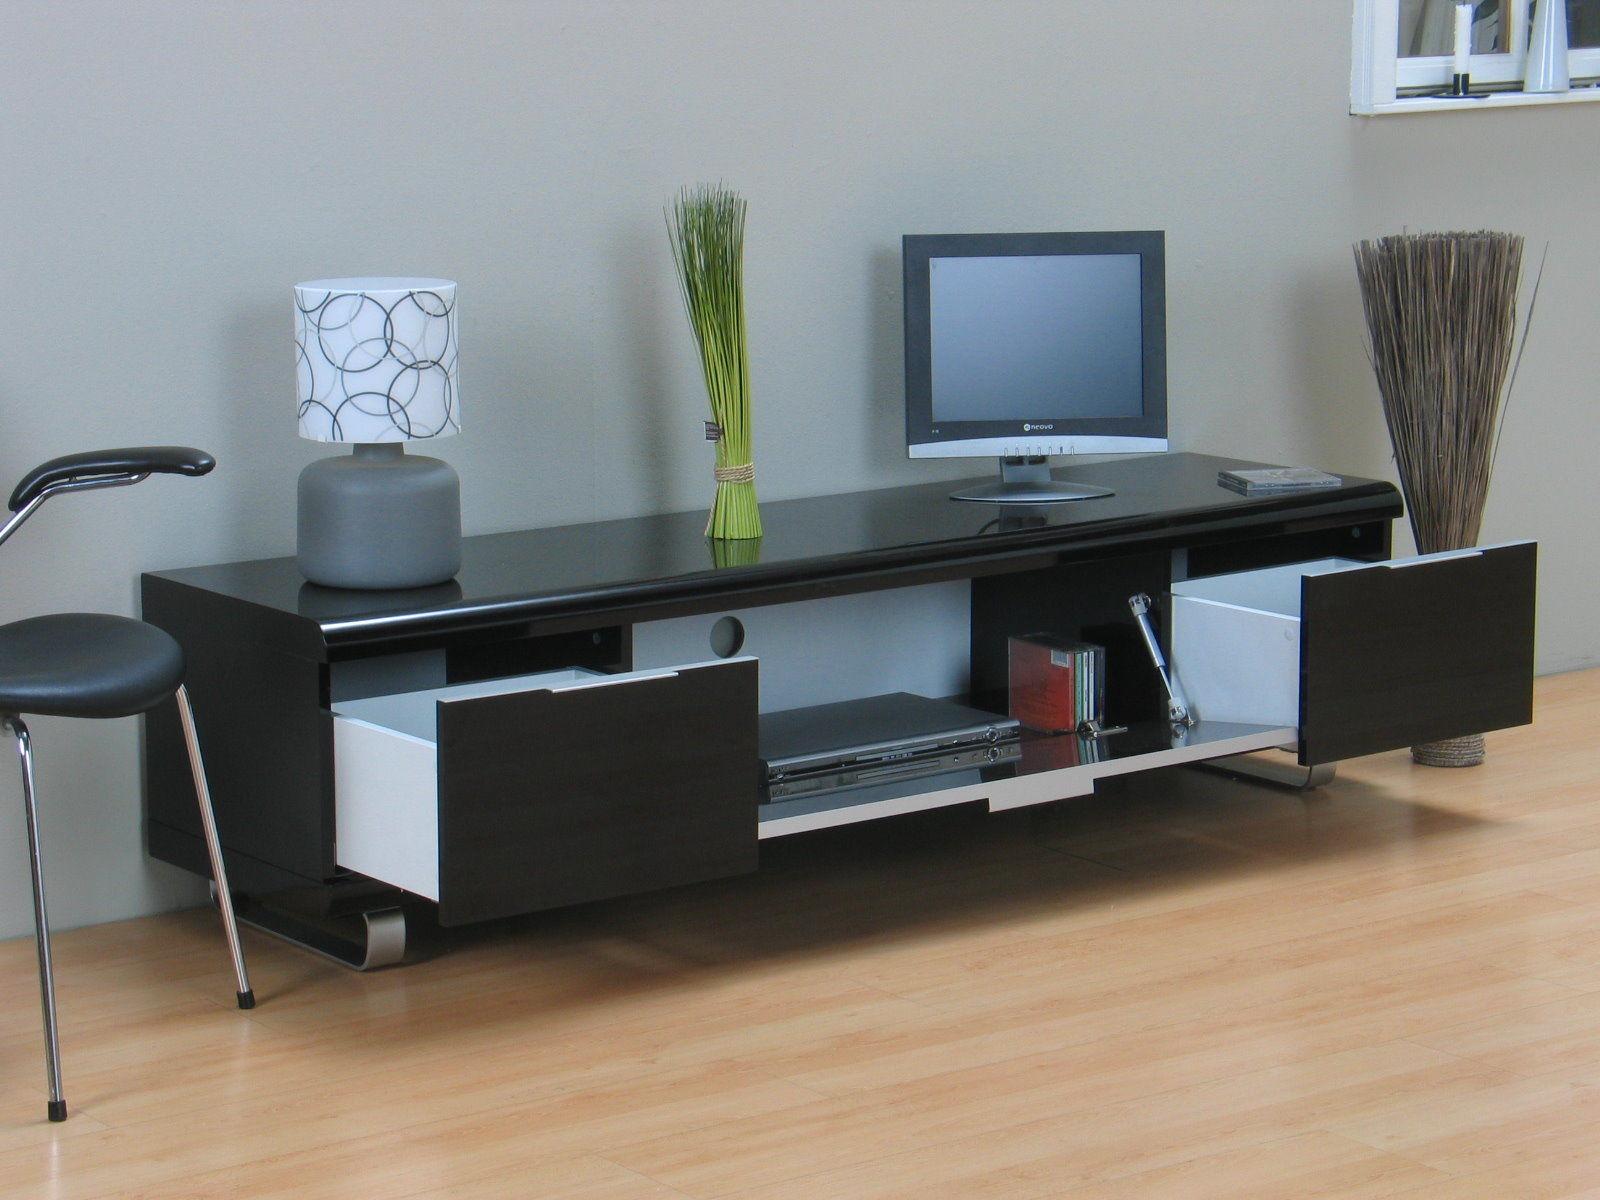 tv board milano hifi tv m bel board lowboard schrank kommode schwarz hochglanz ebay. Black Bedroom Furniture Sets. Home Design Ideas